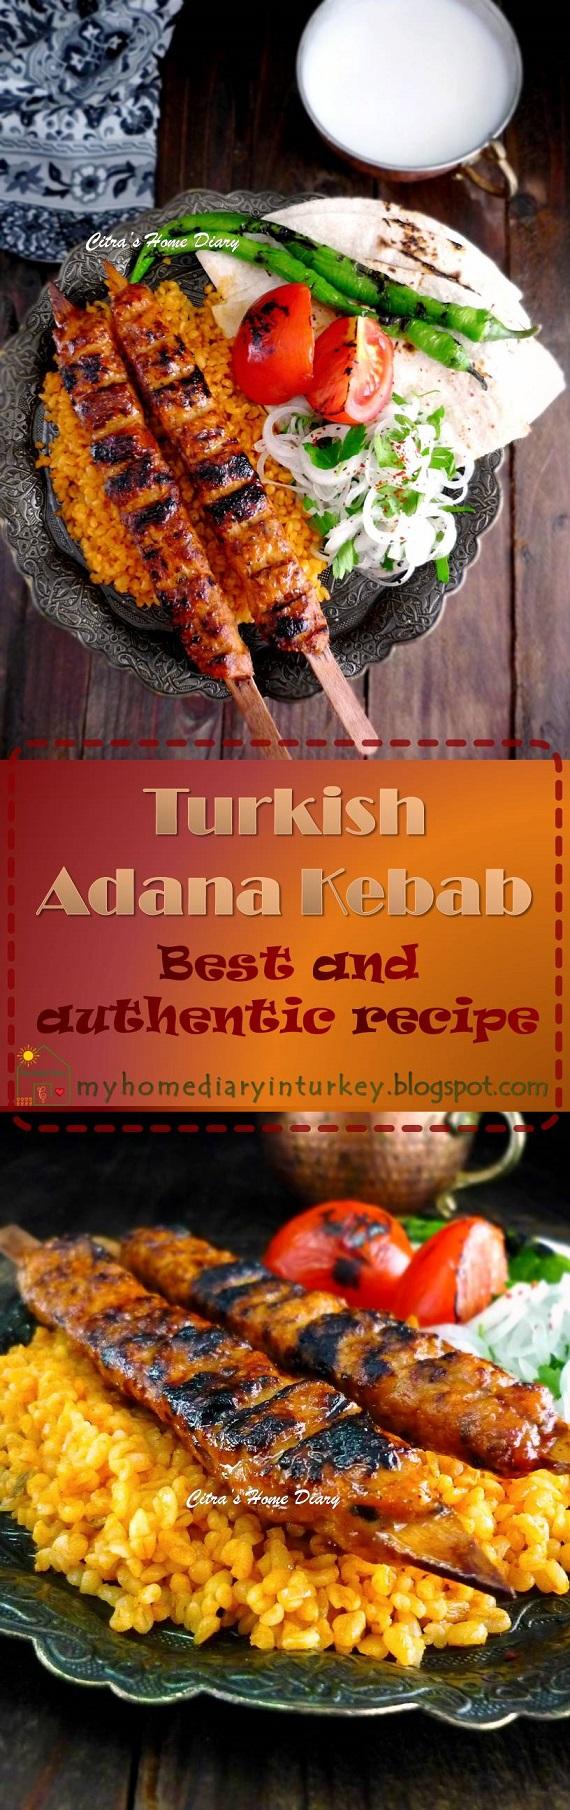 Adana Kebab. Best and authentic recipe. #turkishfood  #resepmasakanturki #caramembuatkebabturki #middleeast #kebab #lamb #meat #kofta #adanakebab #bbq #mangal #authenticrecipe